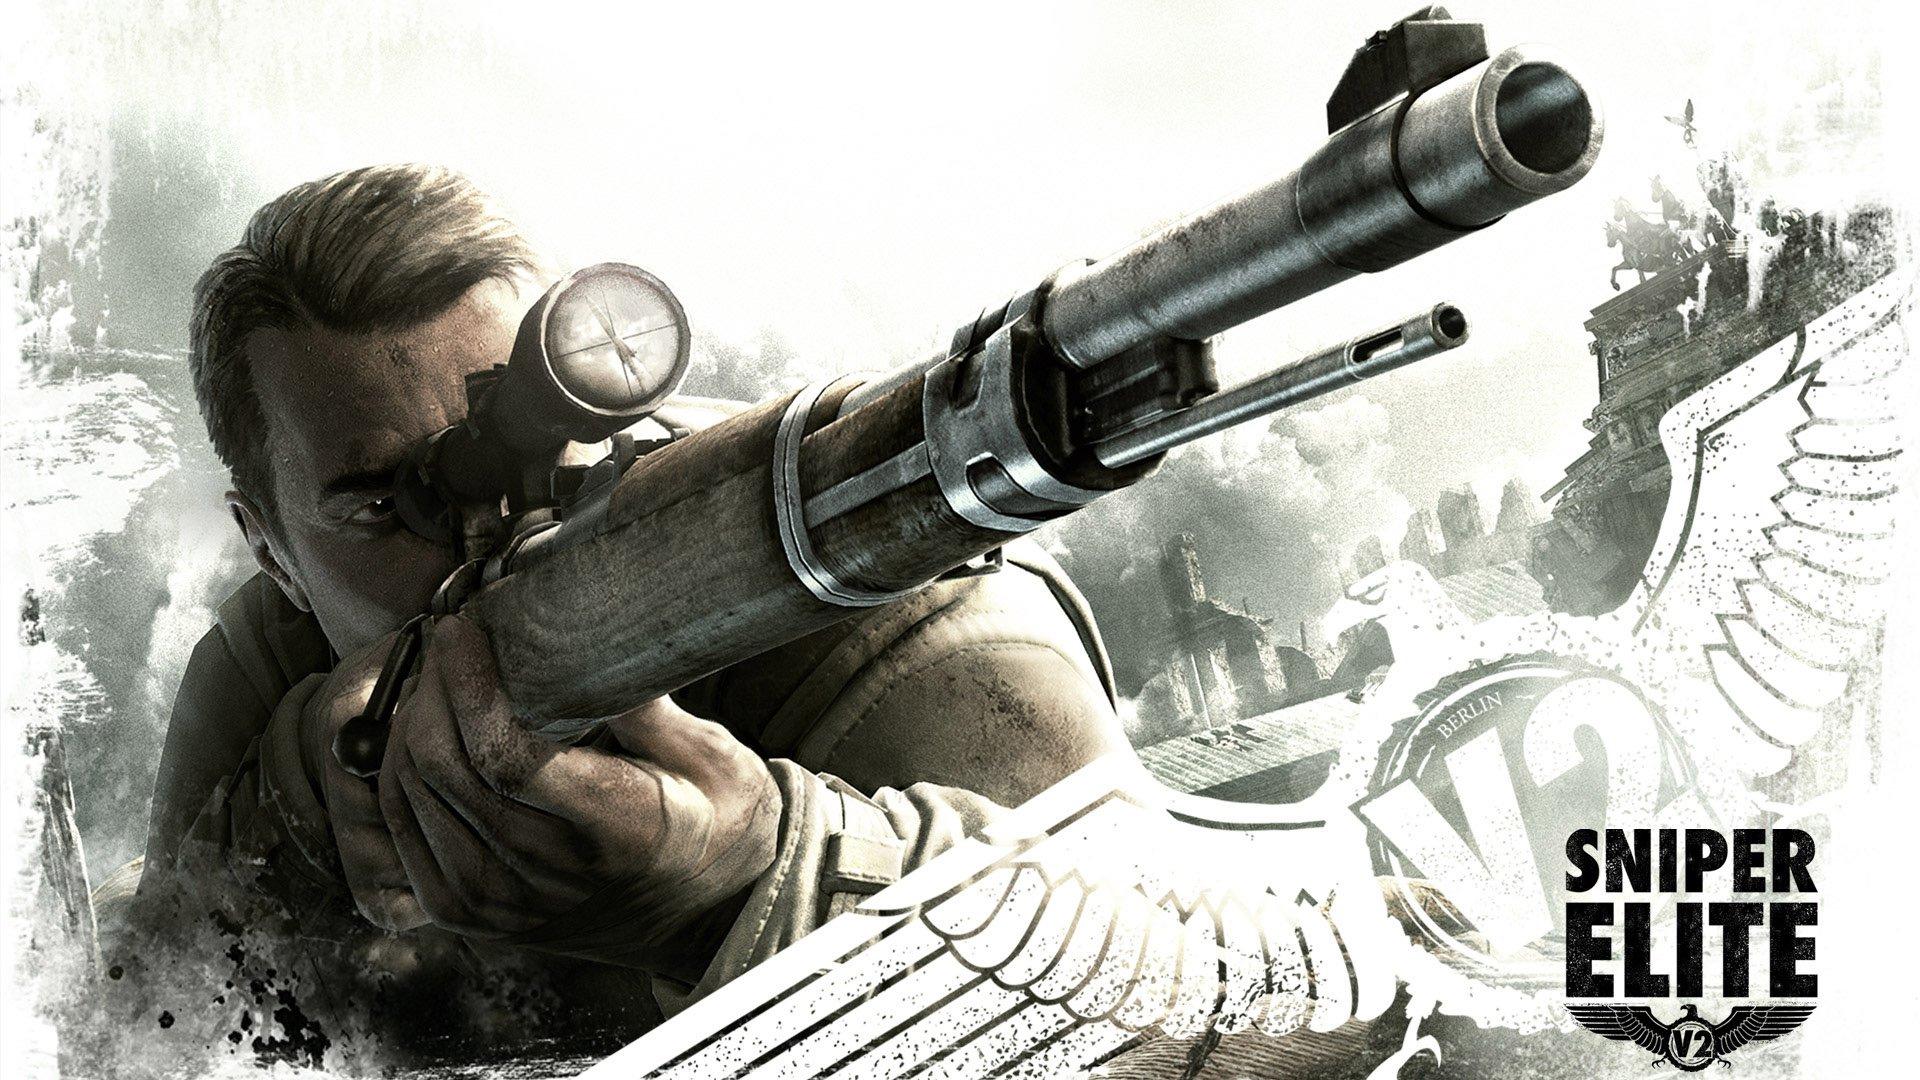 Sniper Elite Wallpapers HD Wallpapers 1920x1080